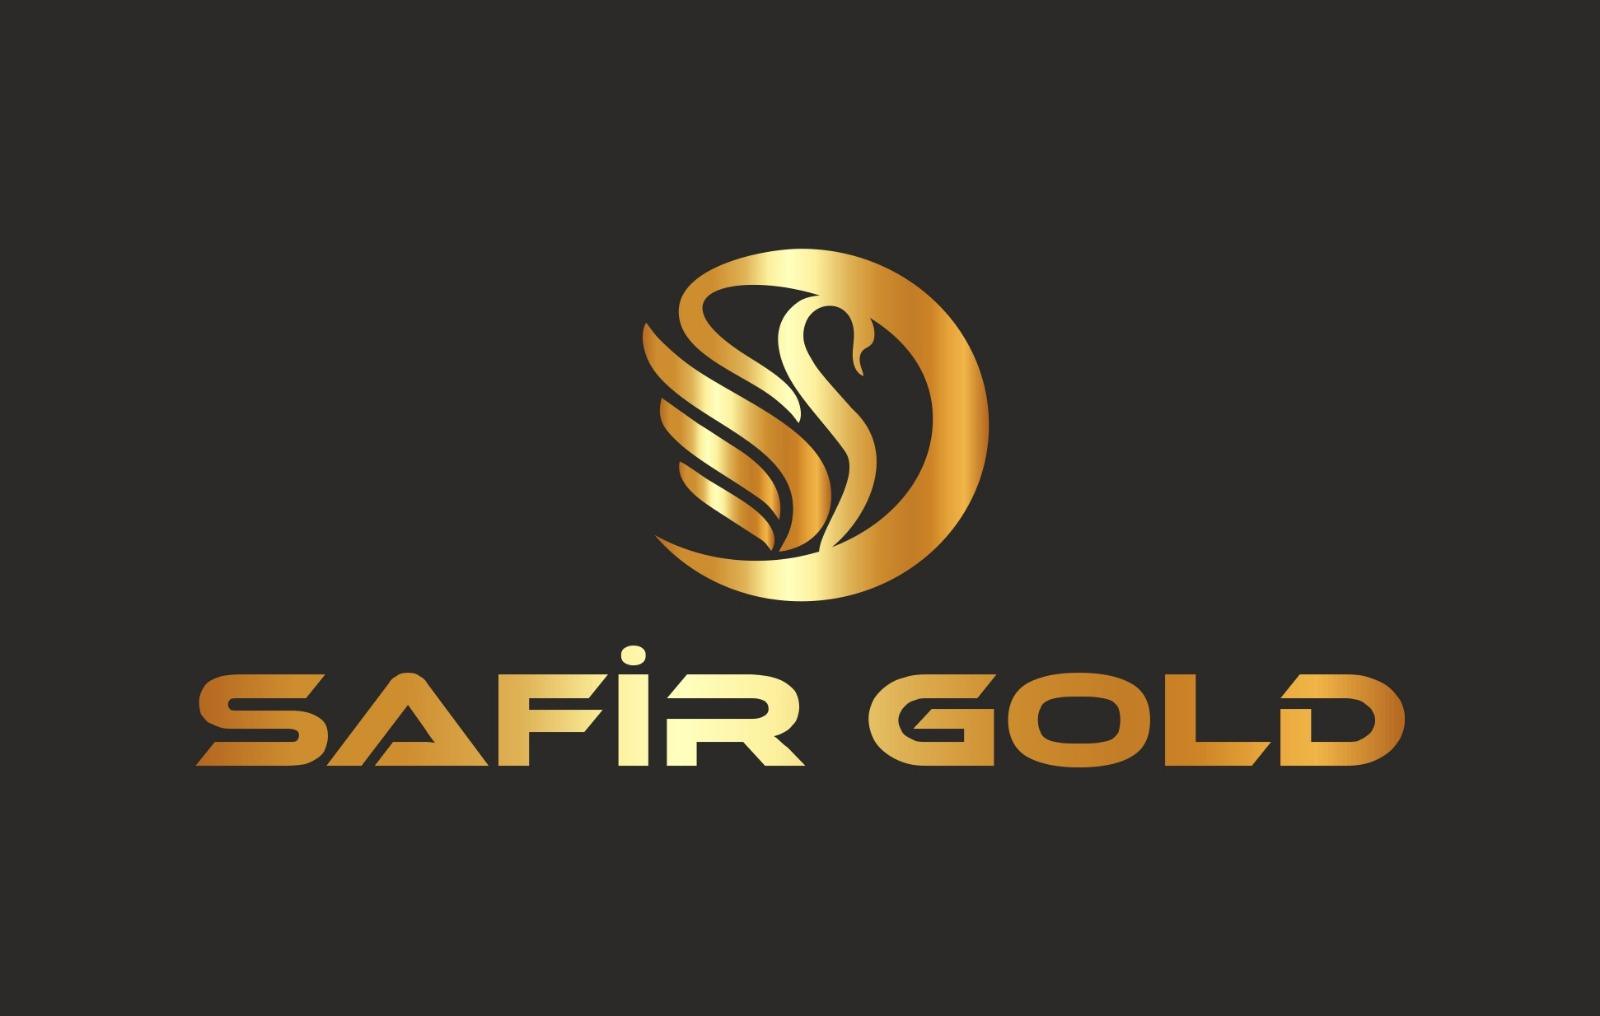 SafirGold